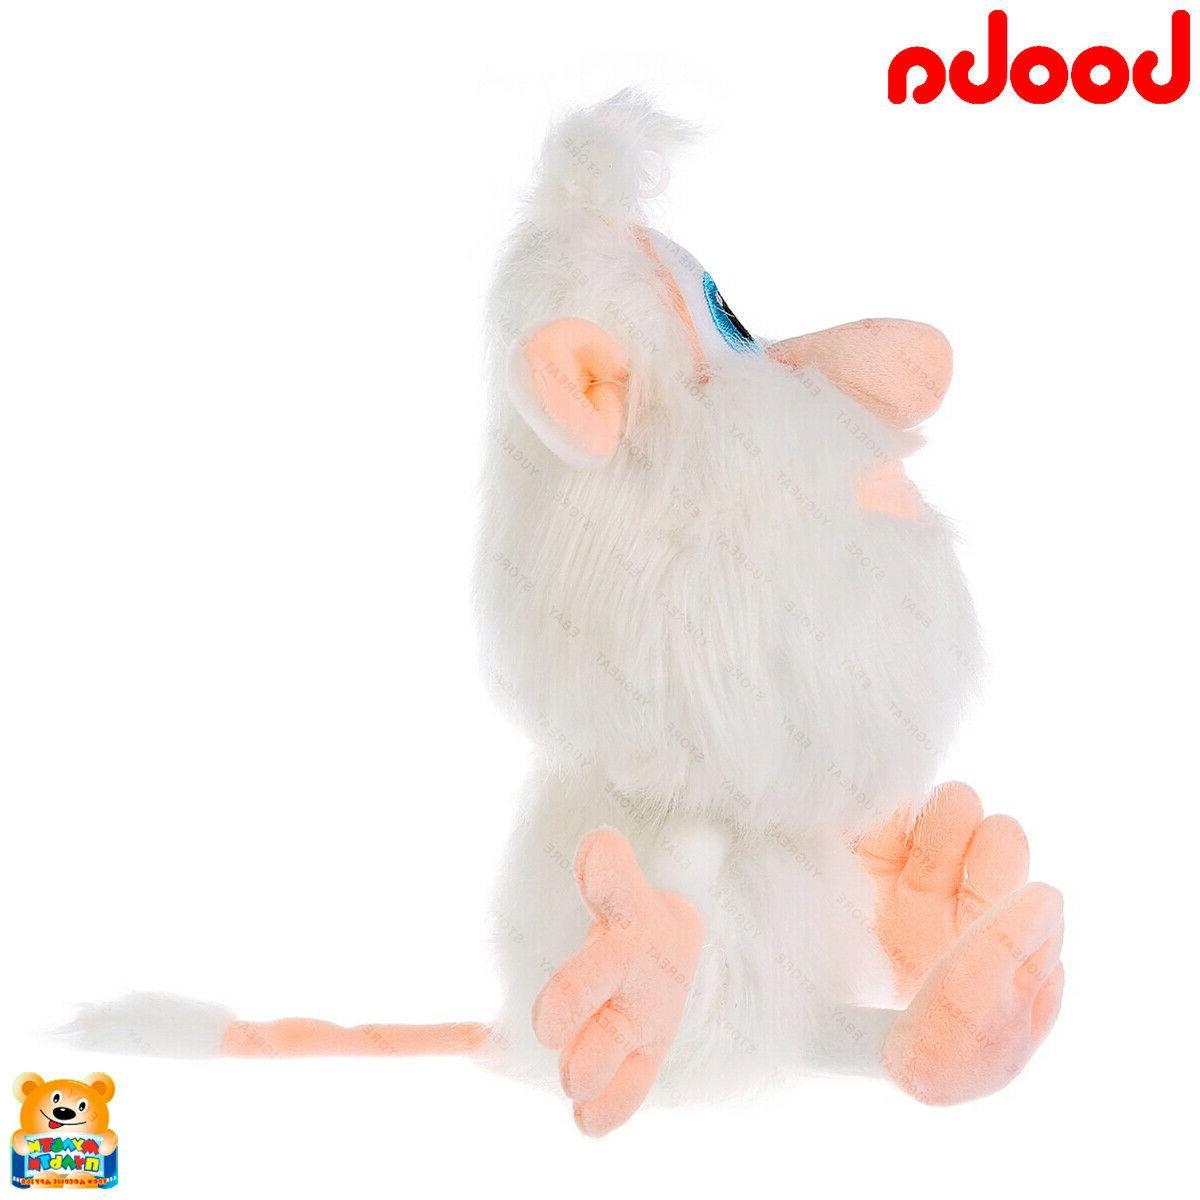 MULTI PULTI Booba, Buba, w/Sound, Toy, Character